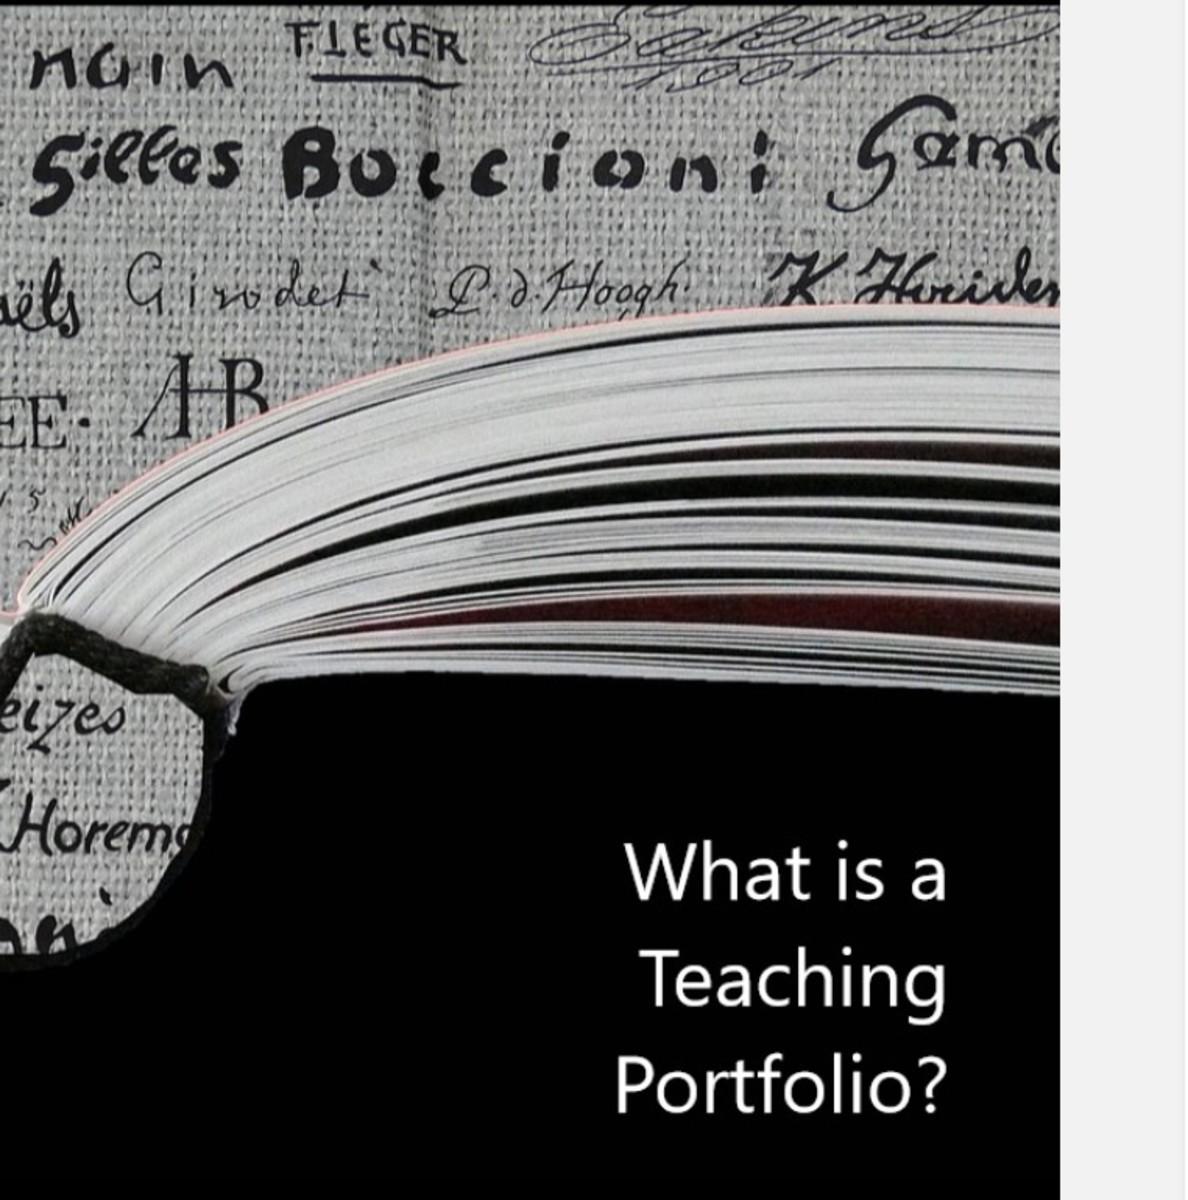 What Is a Teaching Portfolio?